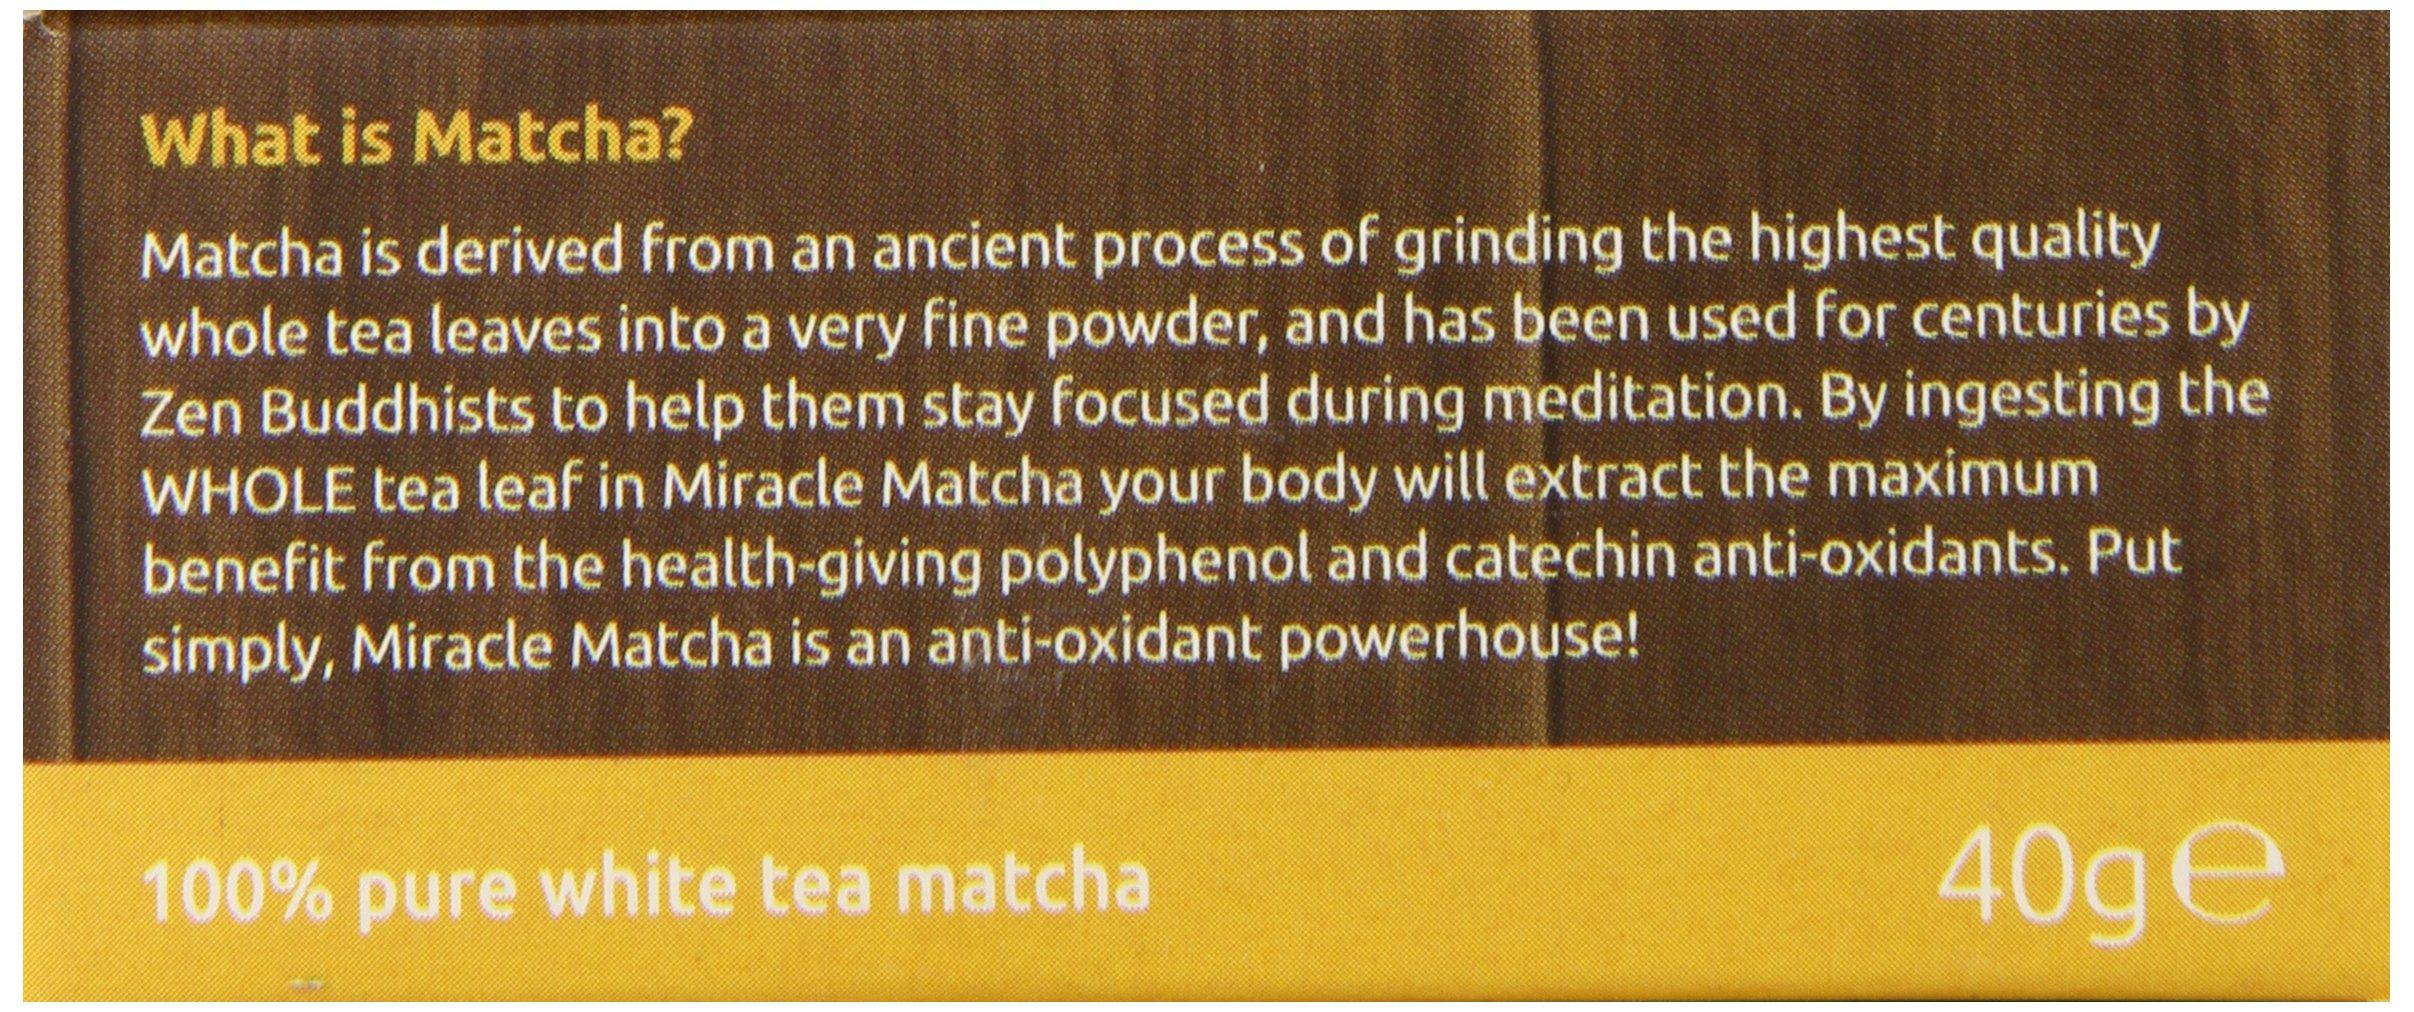 Miracle Matcha 100% Pure White Tea Matcha, 1.41 oz, Polyphenol and Catechin Antioxidants by Miracle Noodle